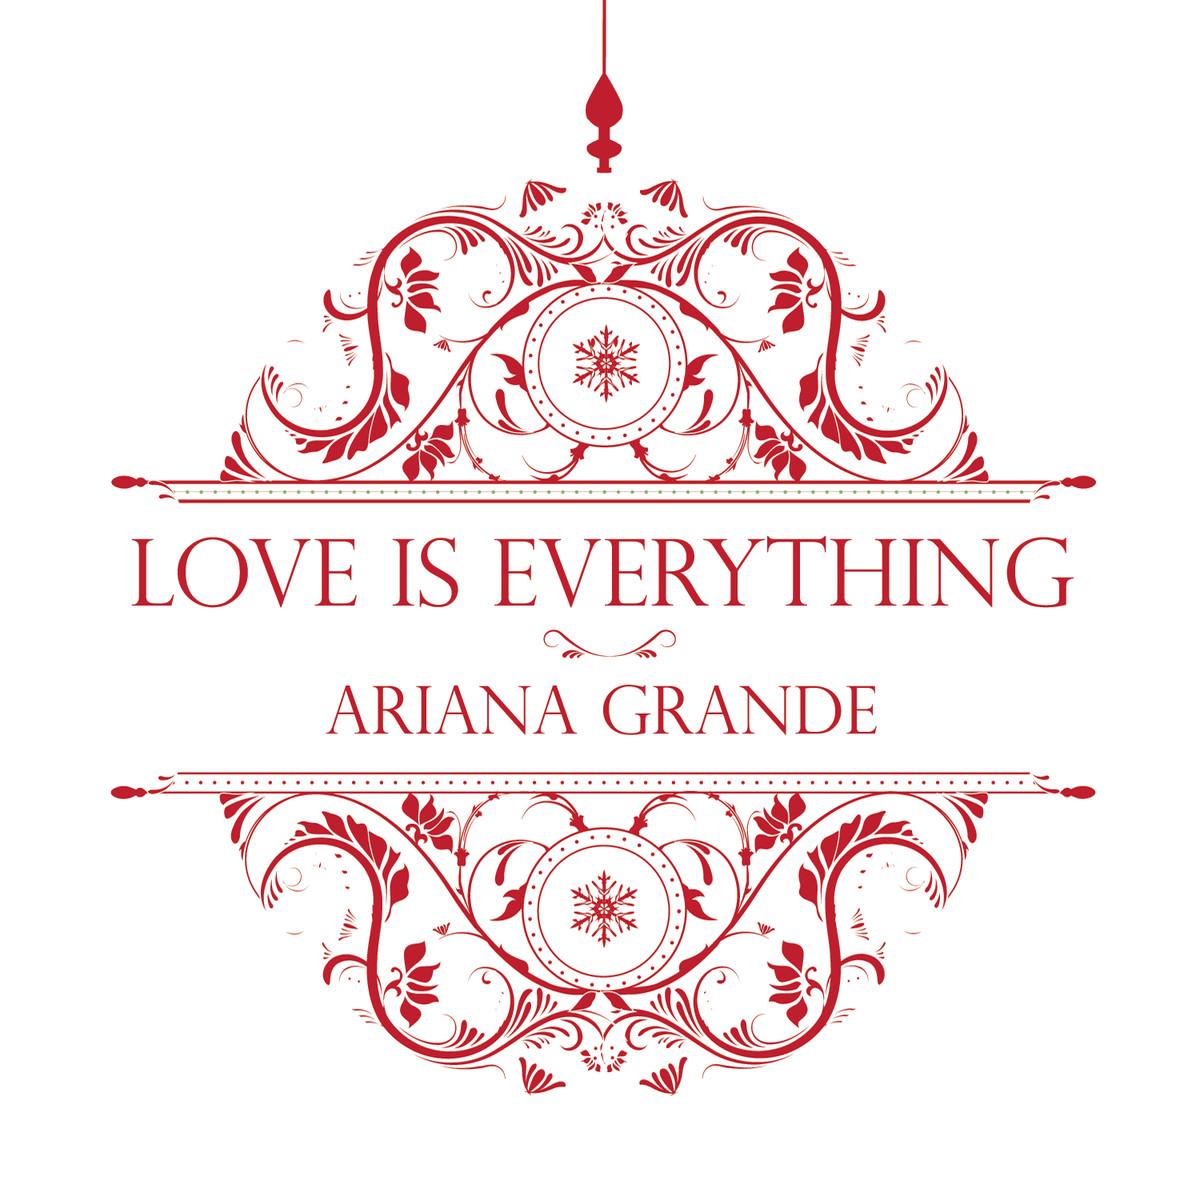 6cebf6928 Love Is Everything | Ariana Grande Wiki | FANDOM powered by Wikia